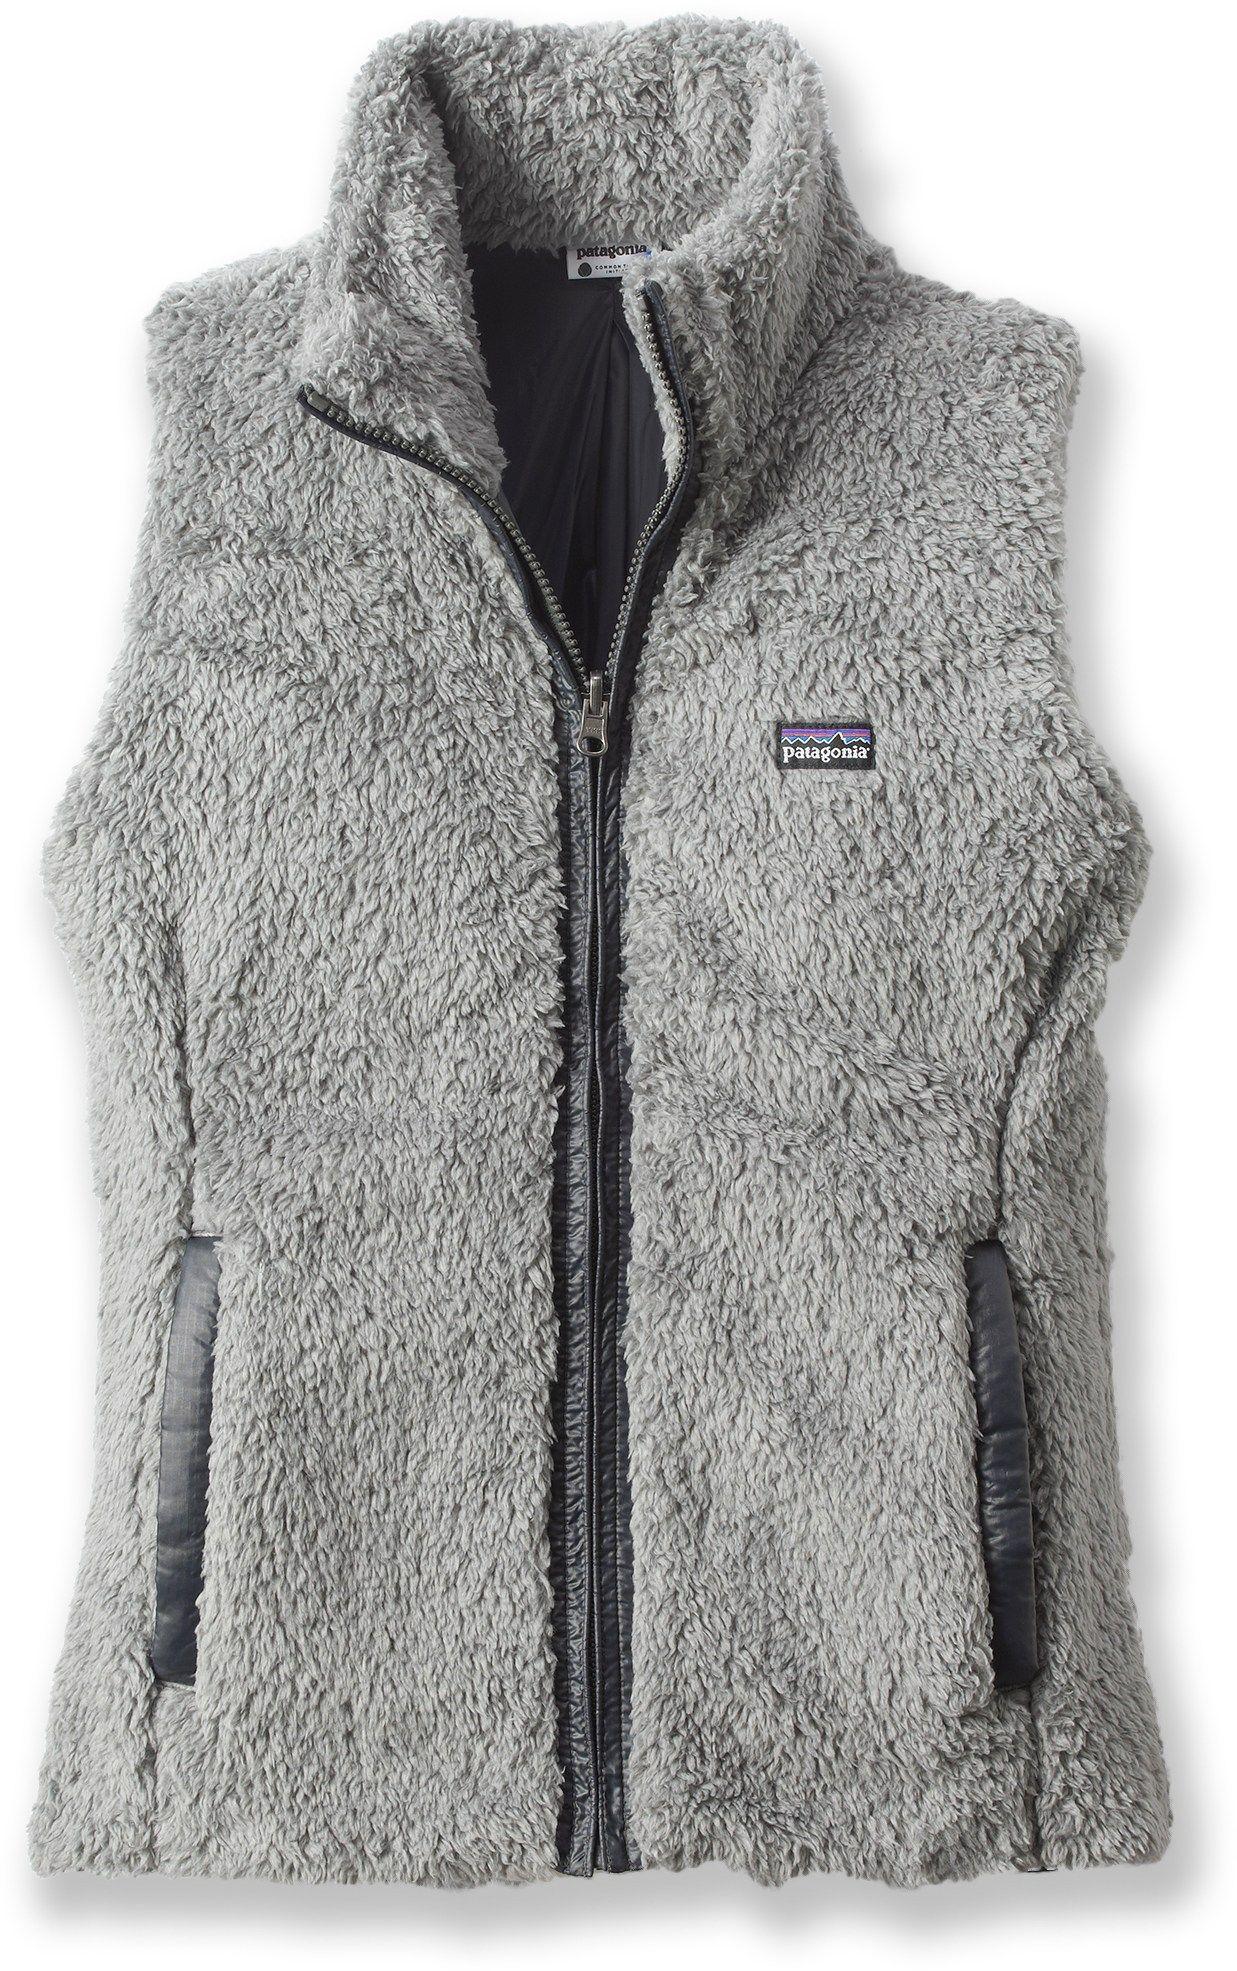 「patagonia Fleece Vest」のベストアイデア 25 選|pinterest のおすすめ